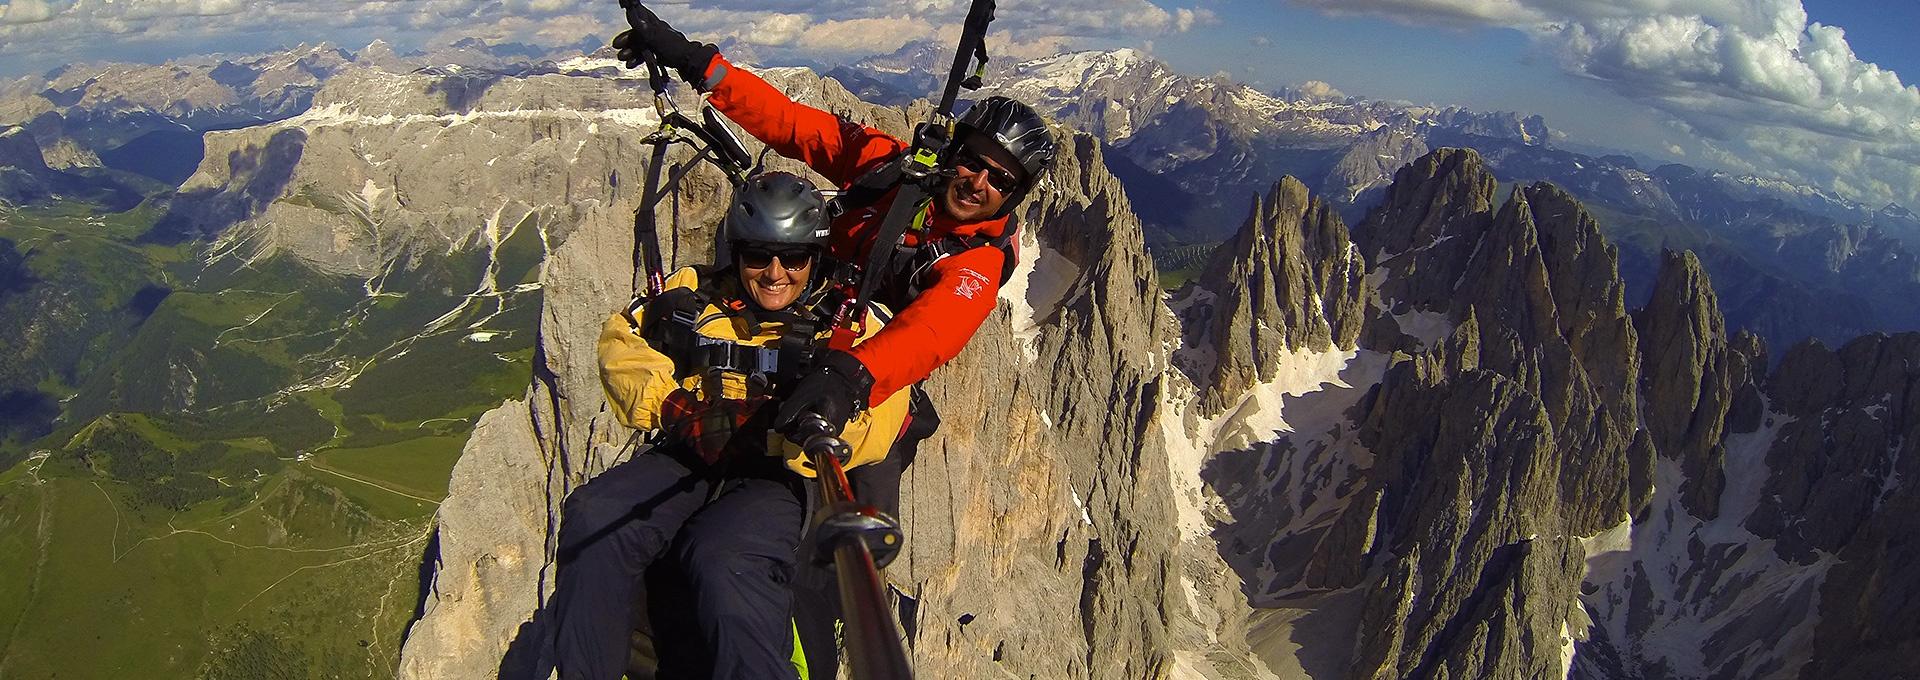 parapendiobiposto Val Gardena - Dolomiti